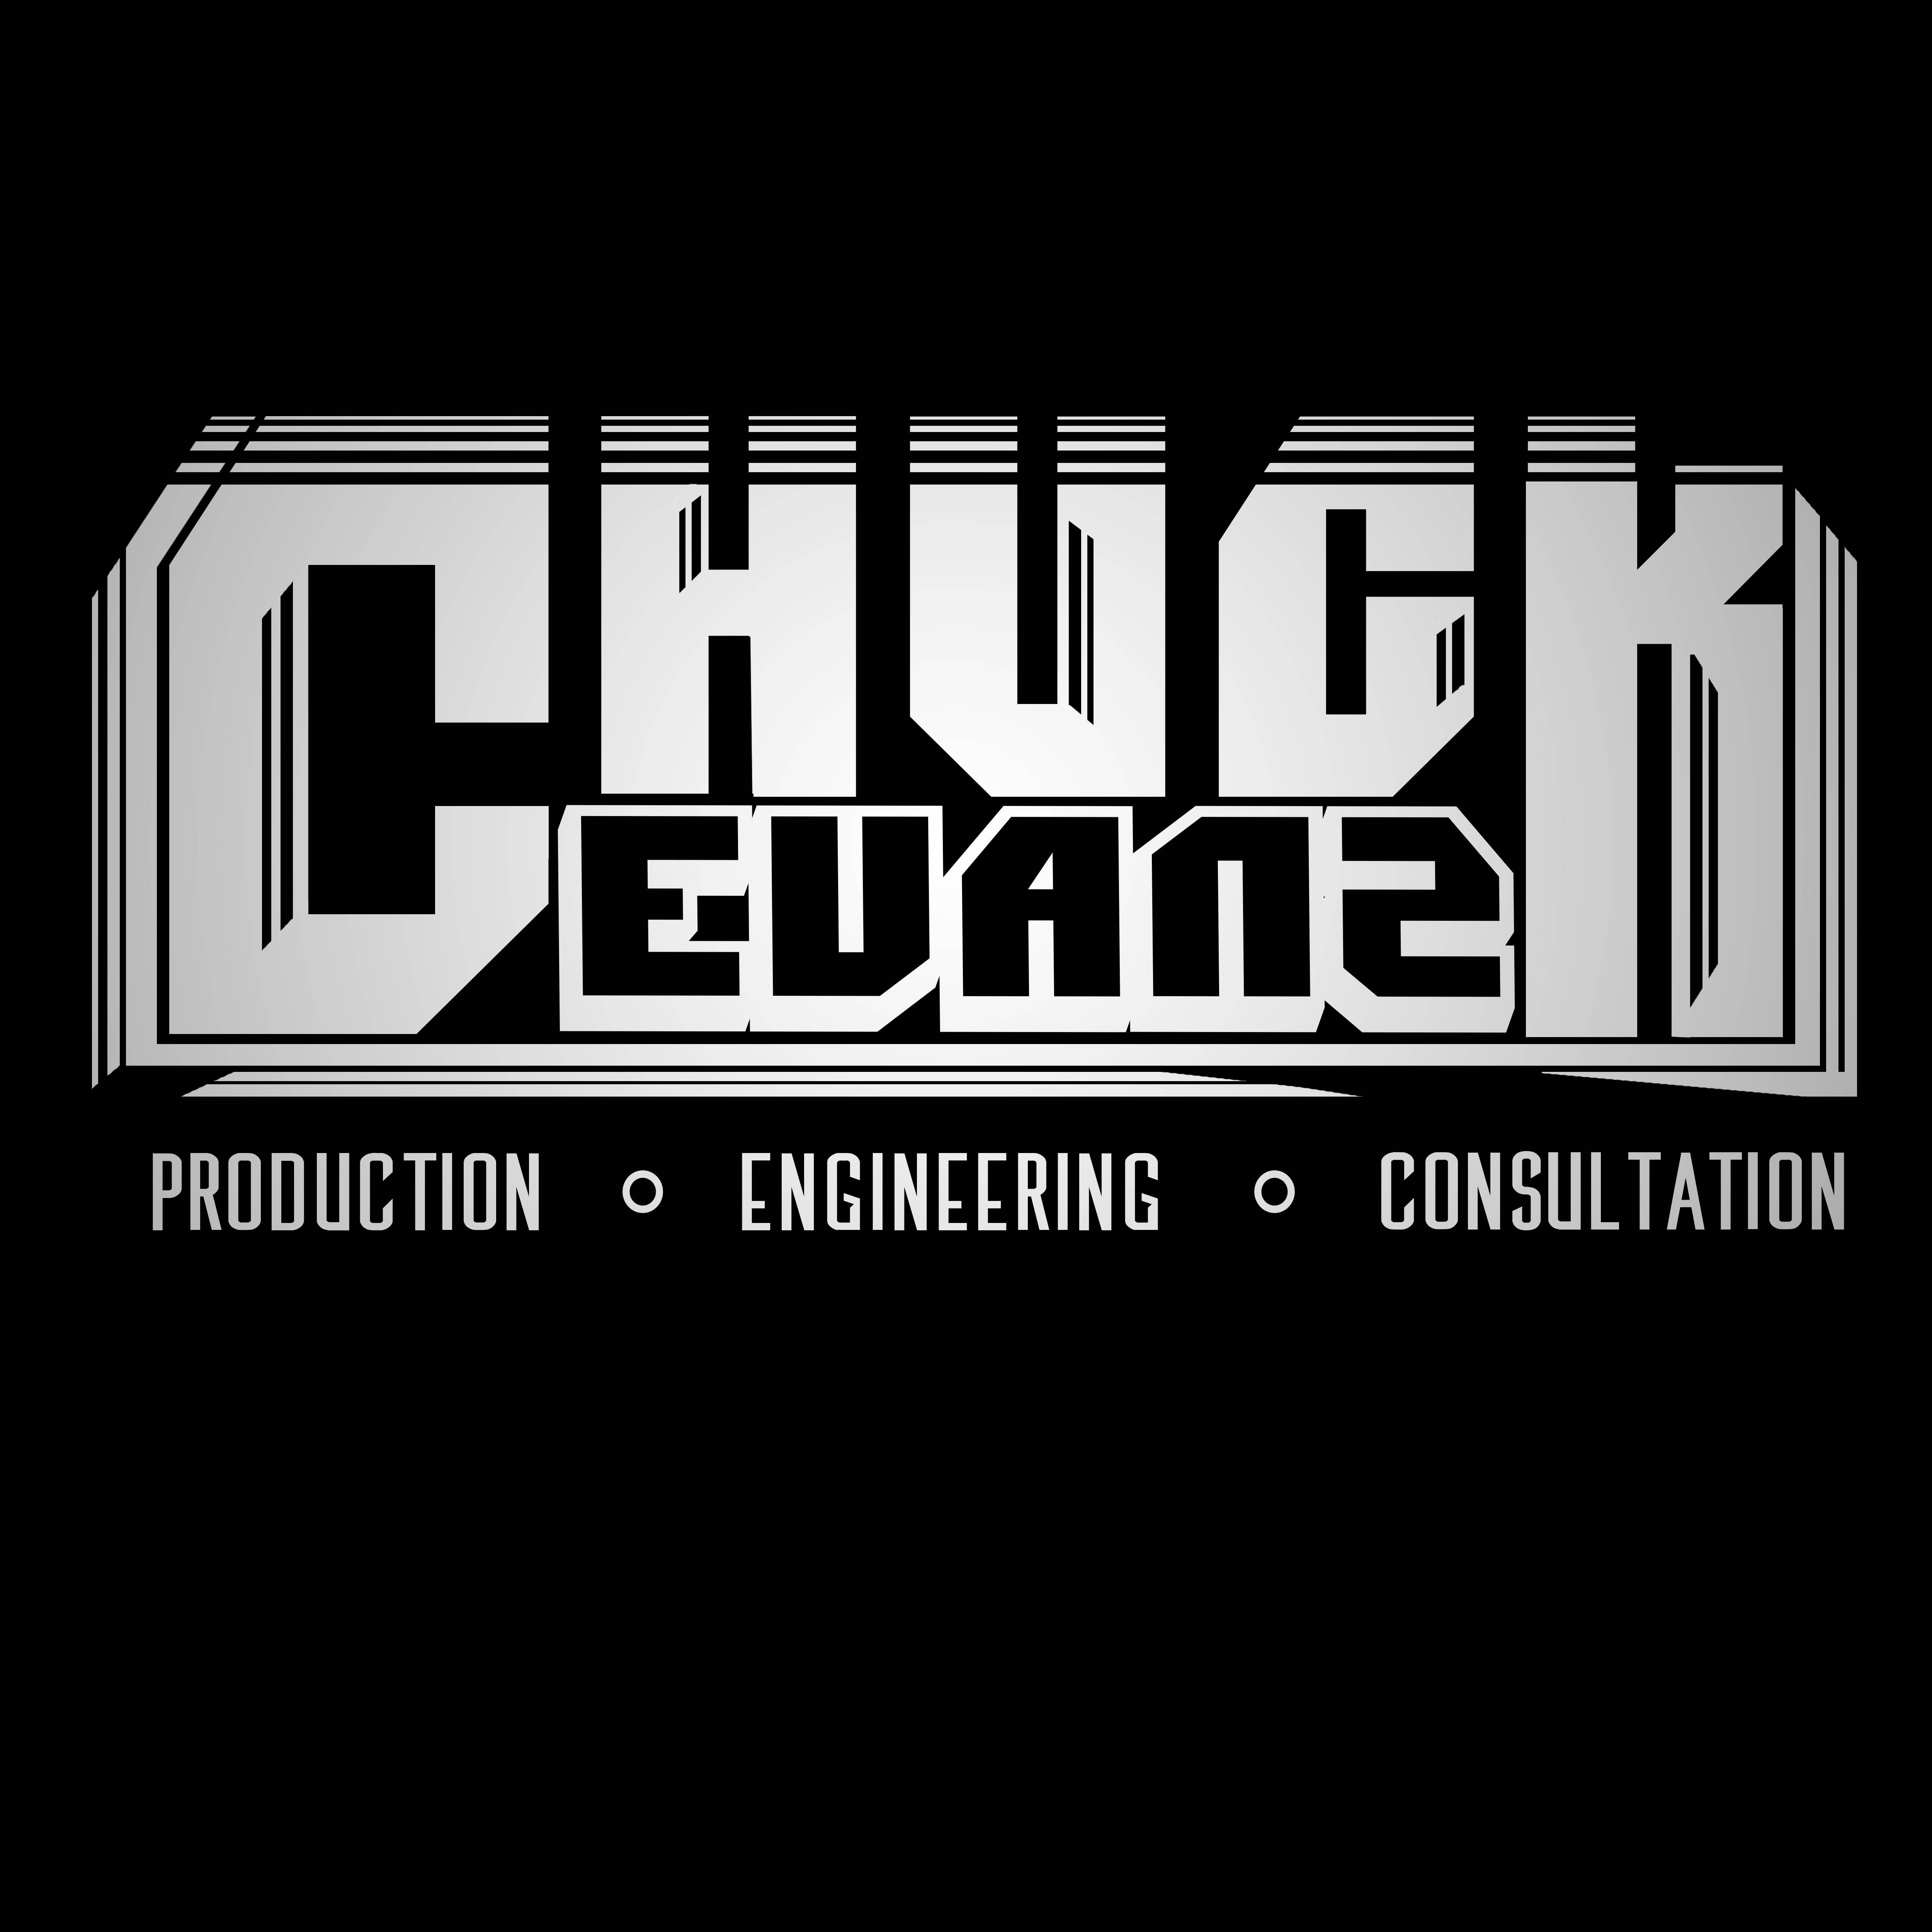 Chuck_evanz_add-logo